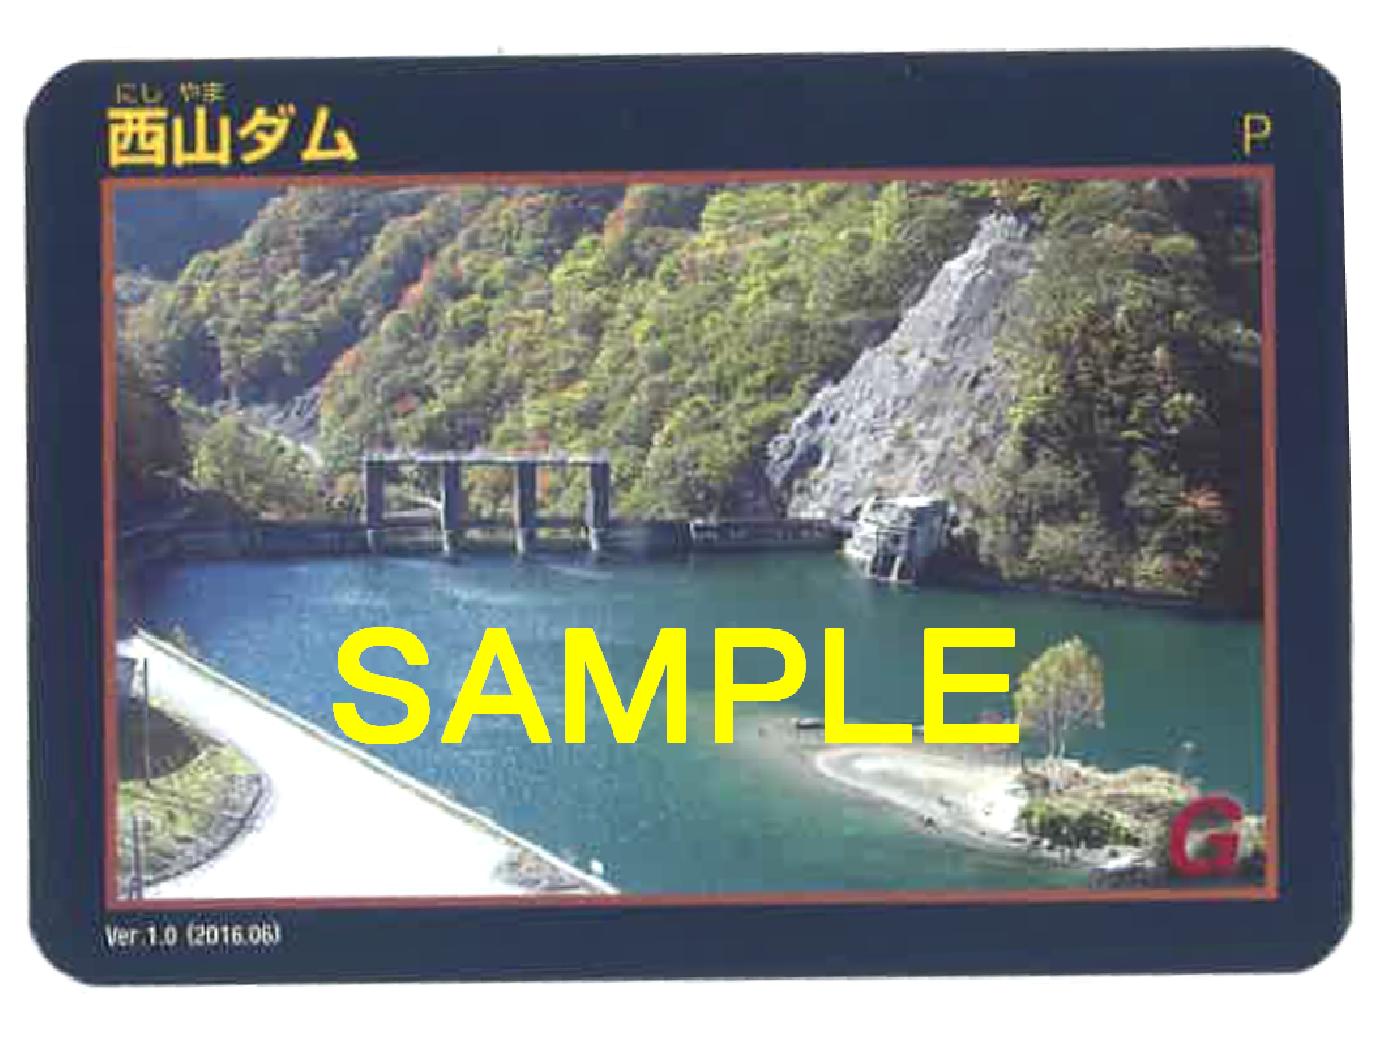 http://www.yamanashi-kankou.jp/blog/%E2%91%A0.png